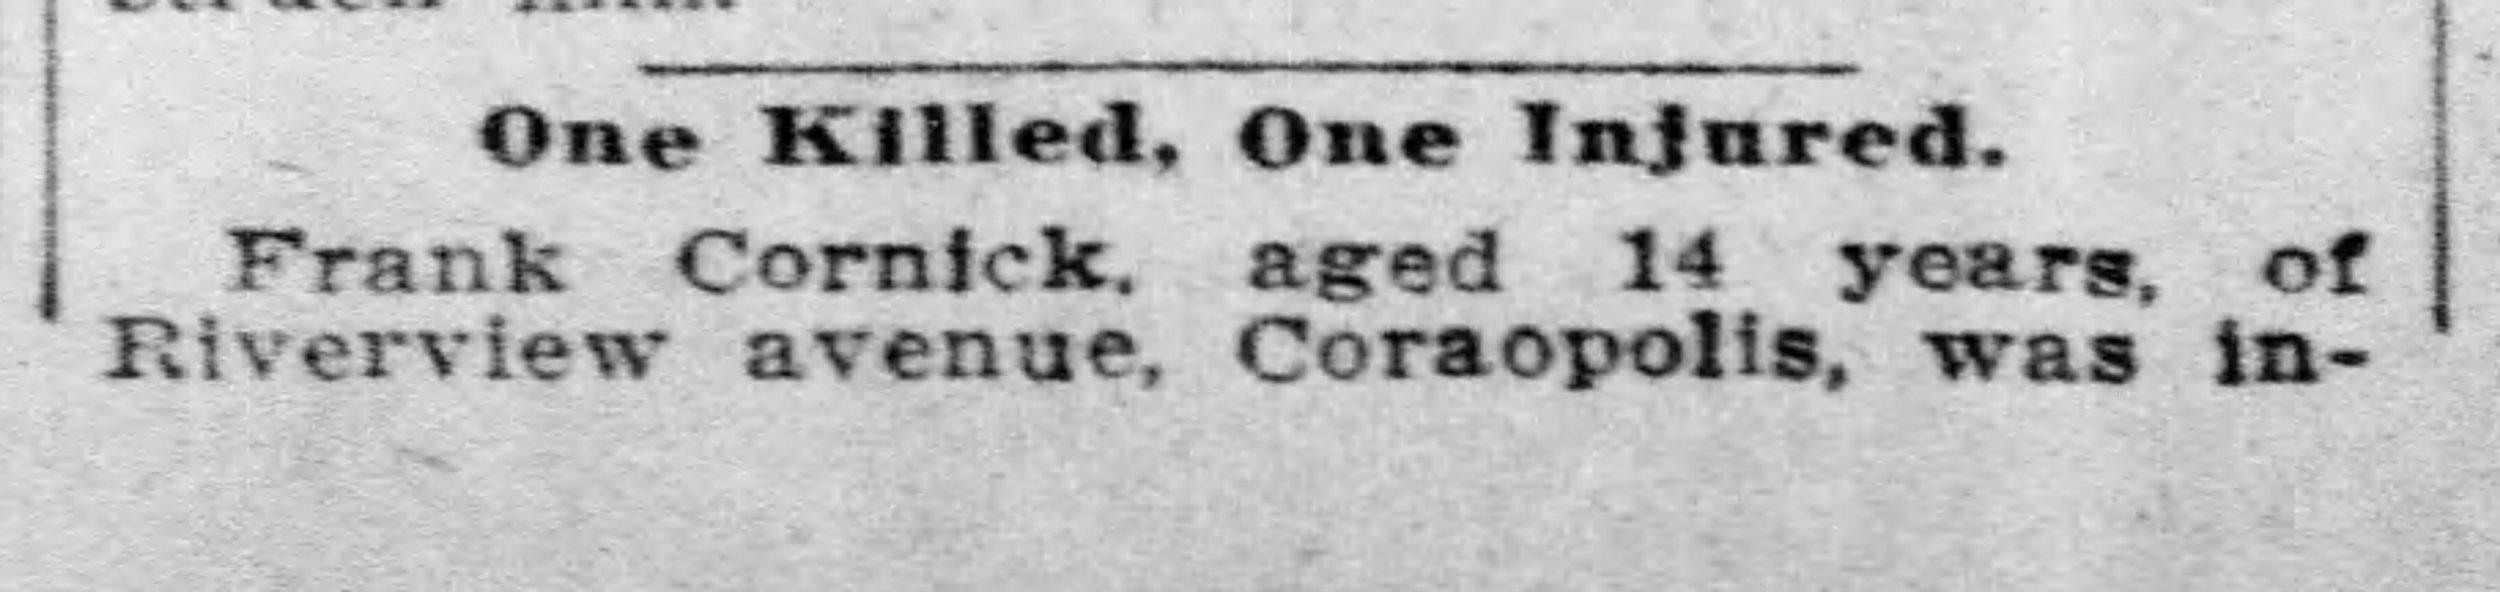 1905-12-21 The_Pittsburgh_Press (1).jpg